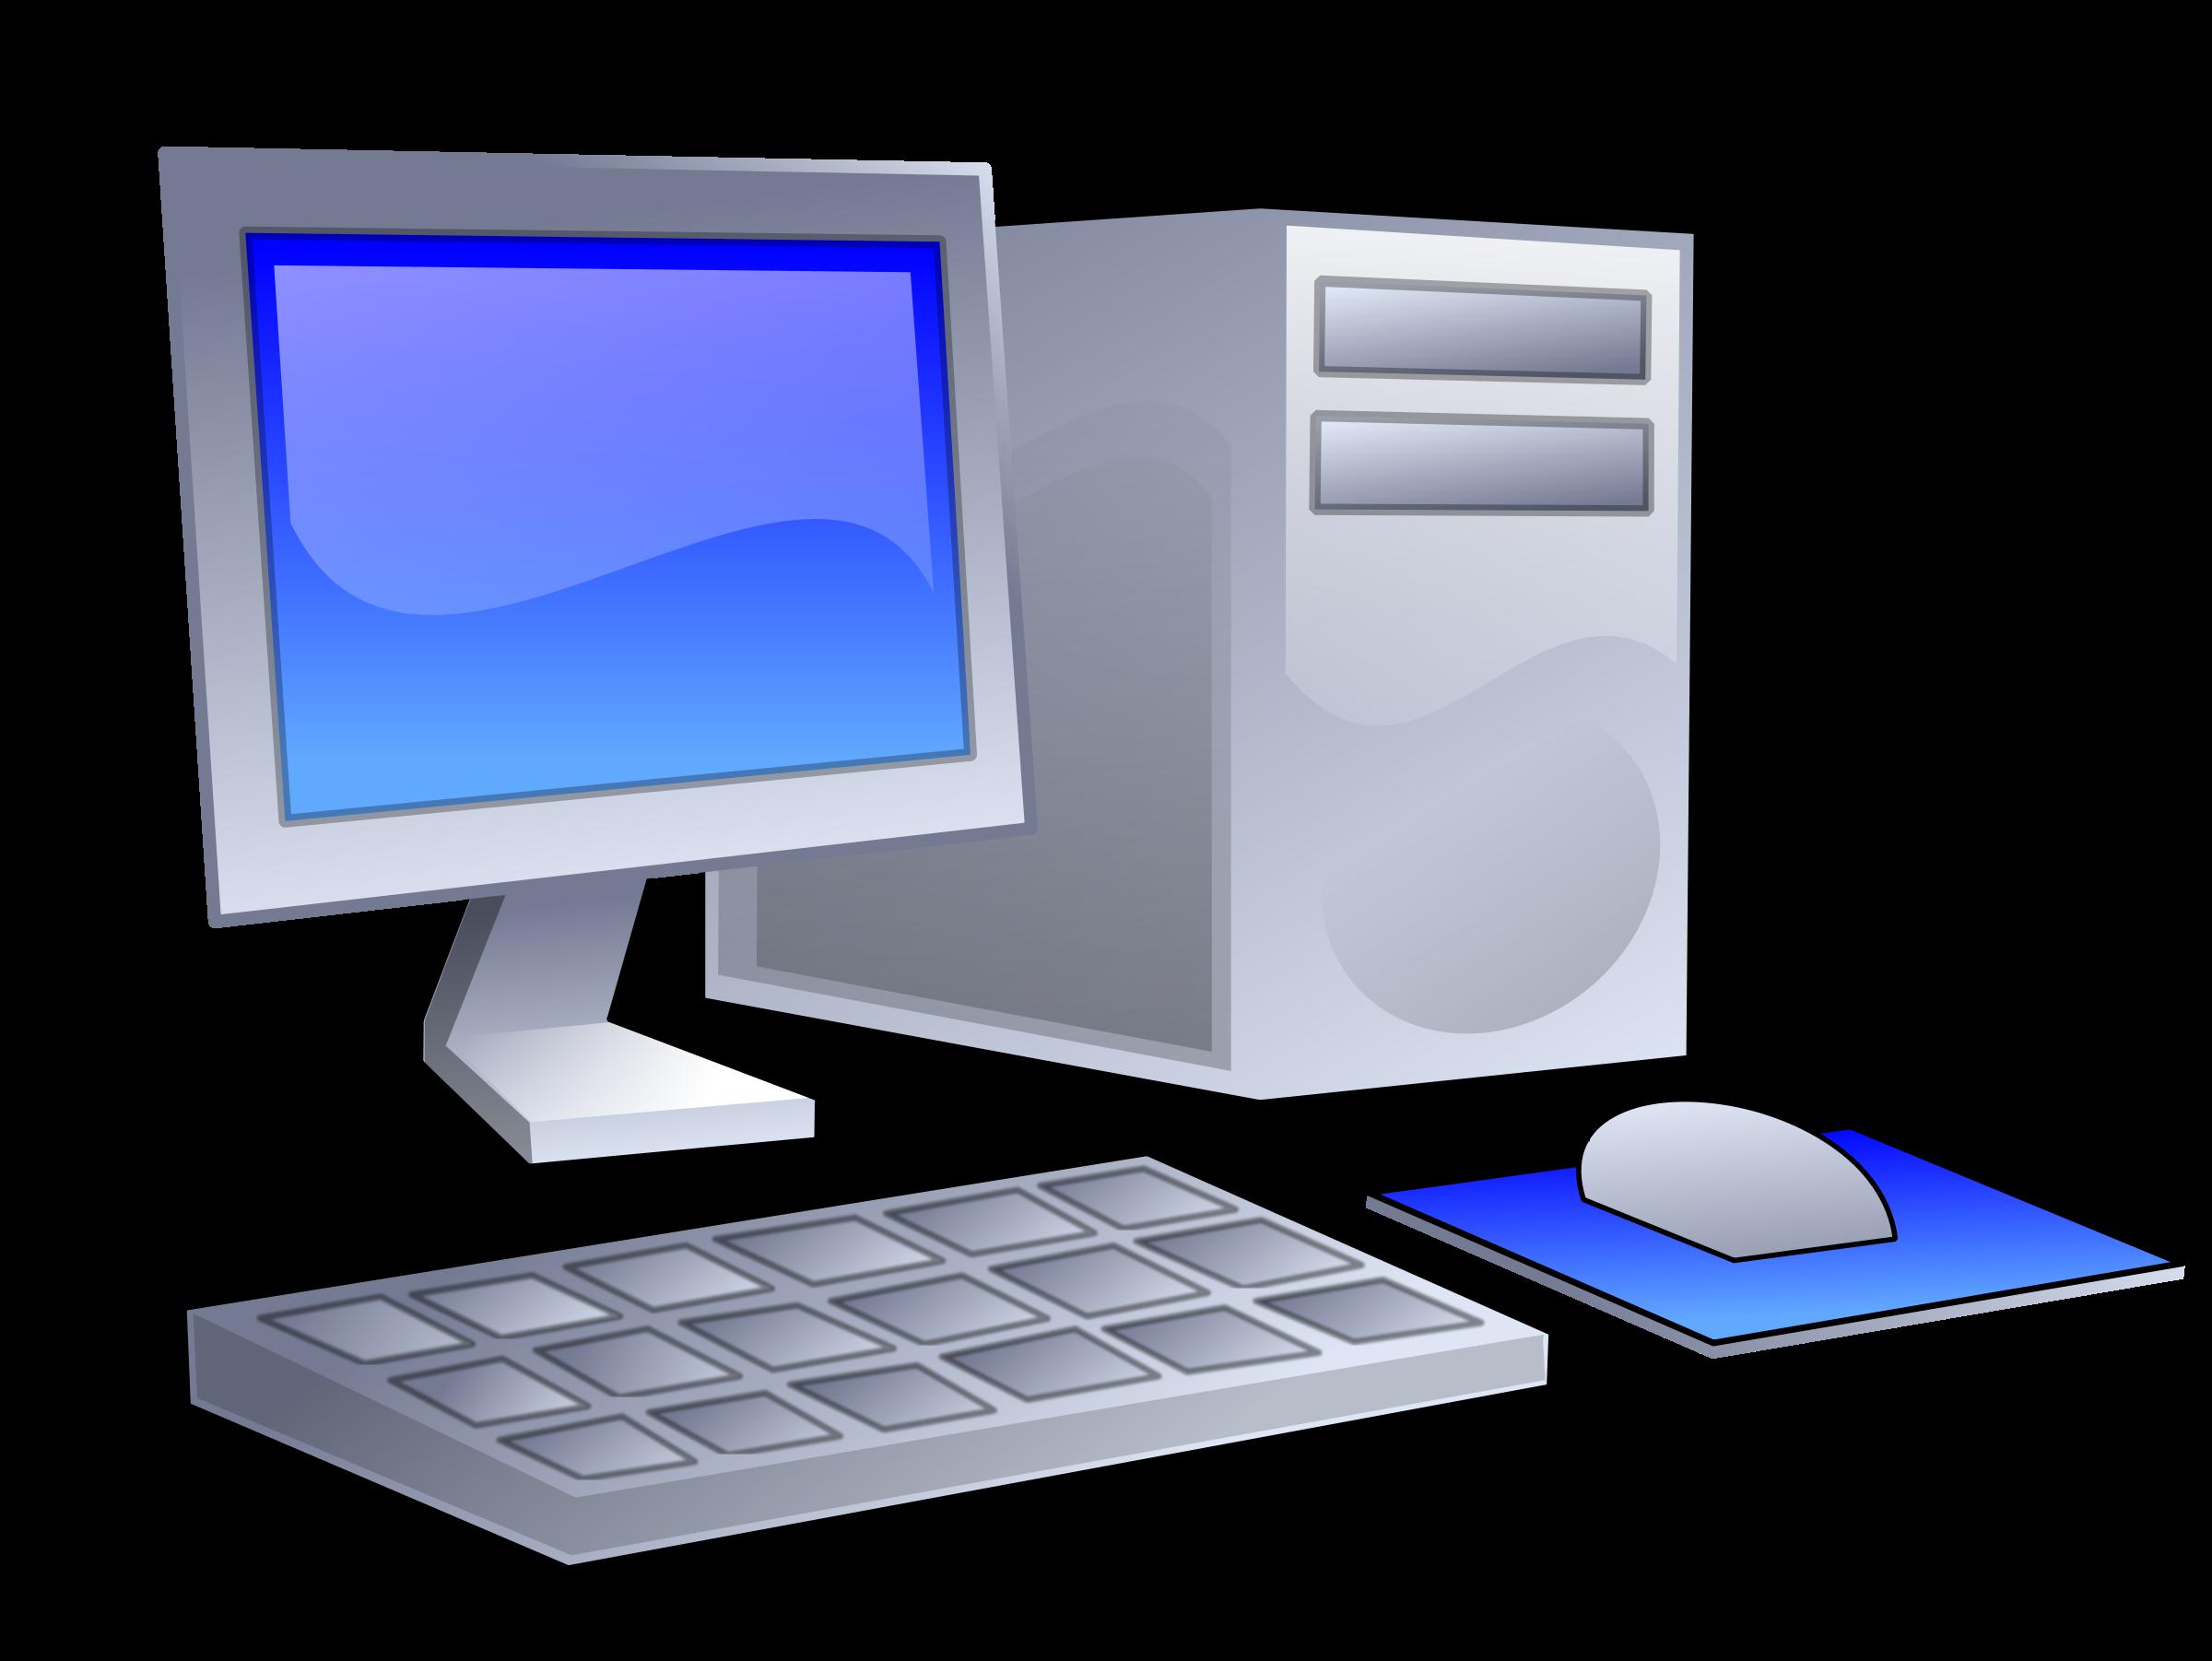 Clipart Computer & Computer Clip Art Images.